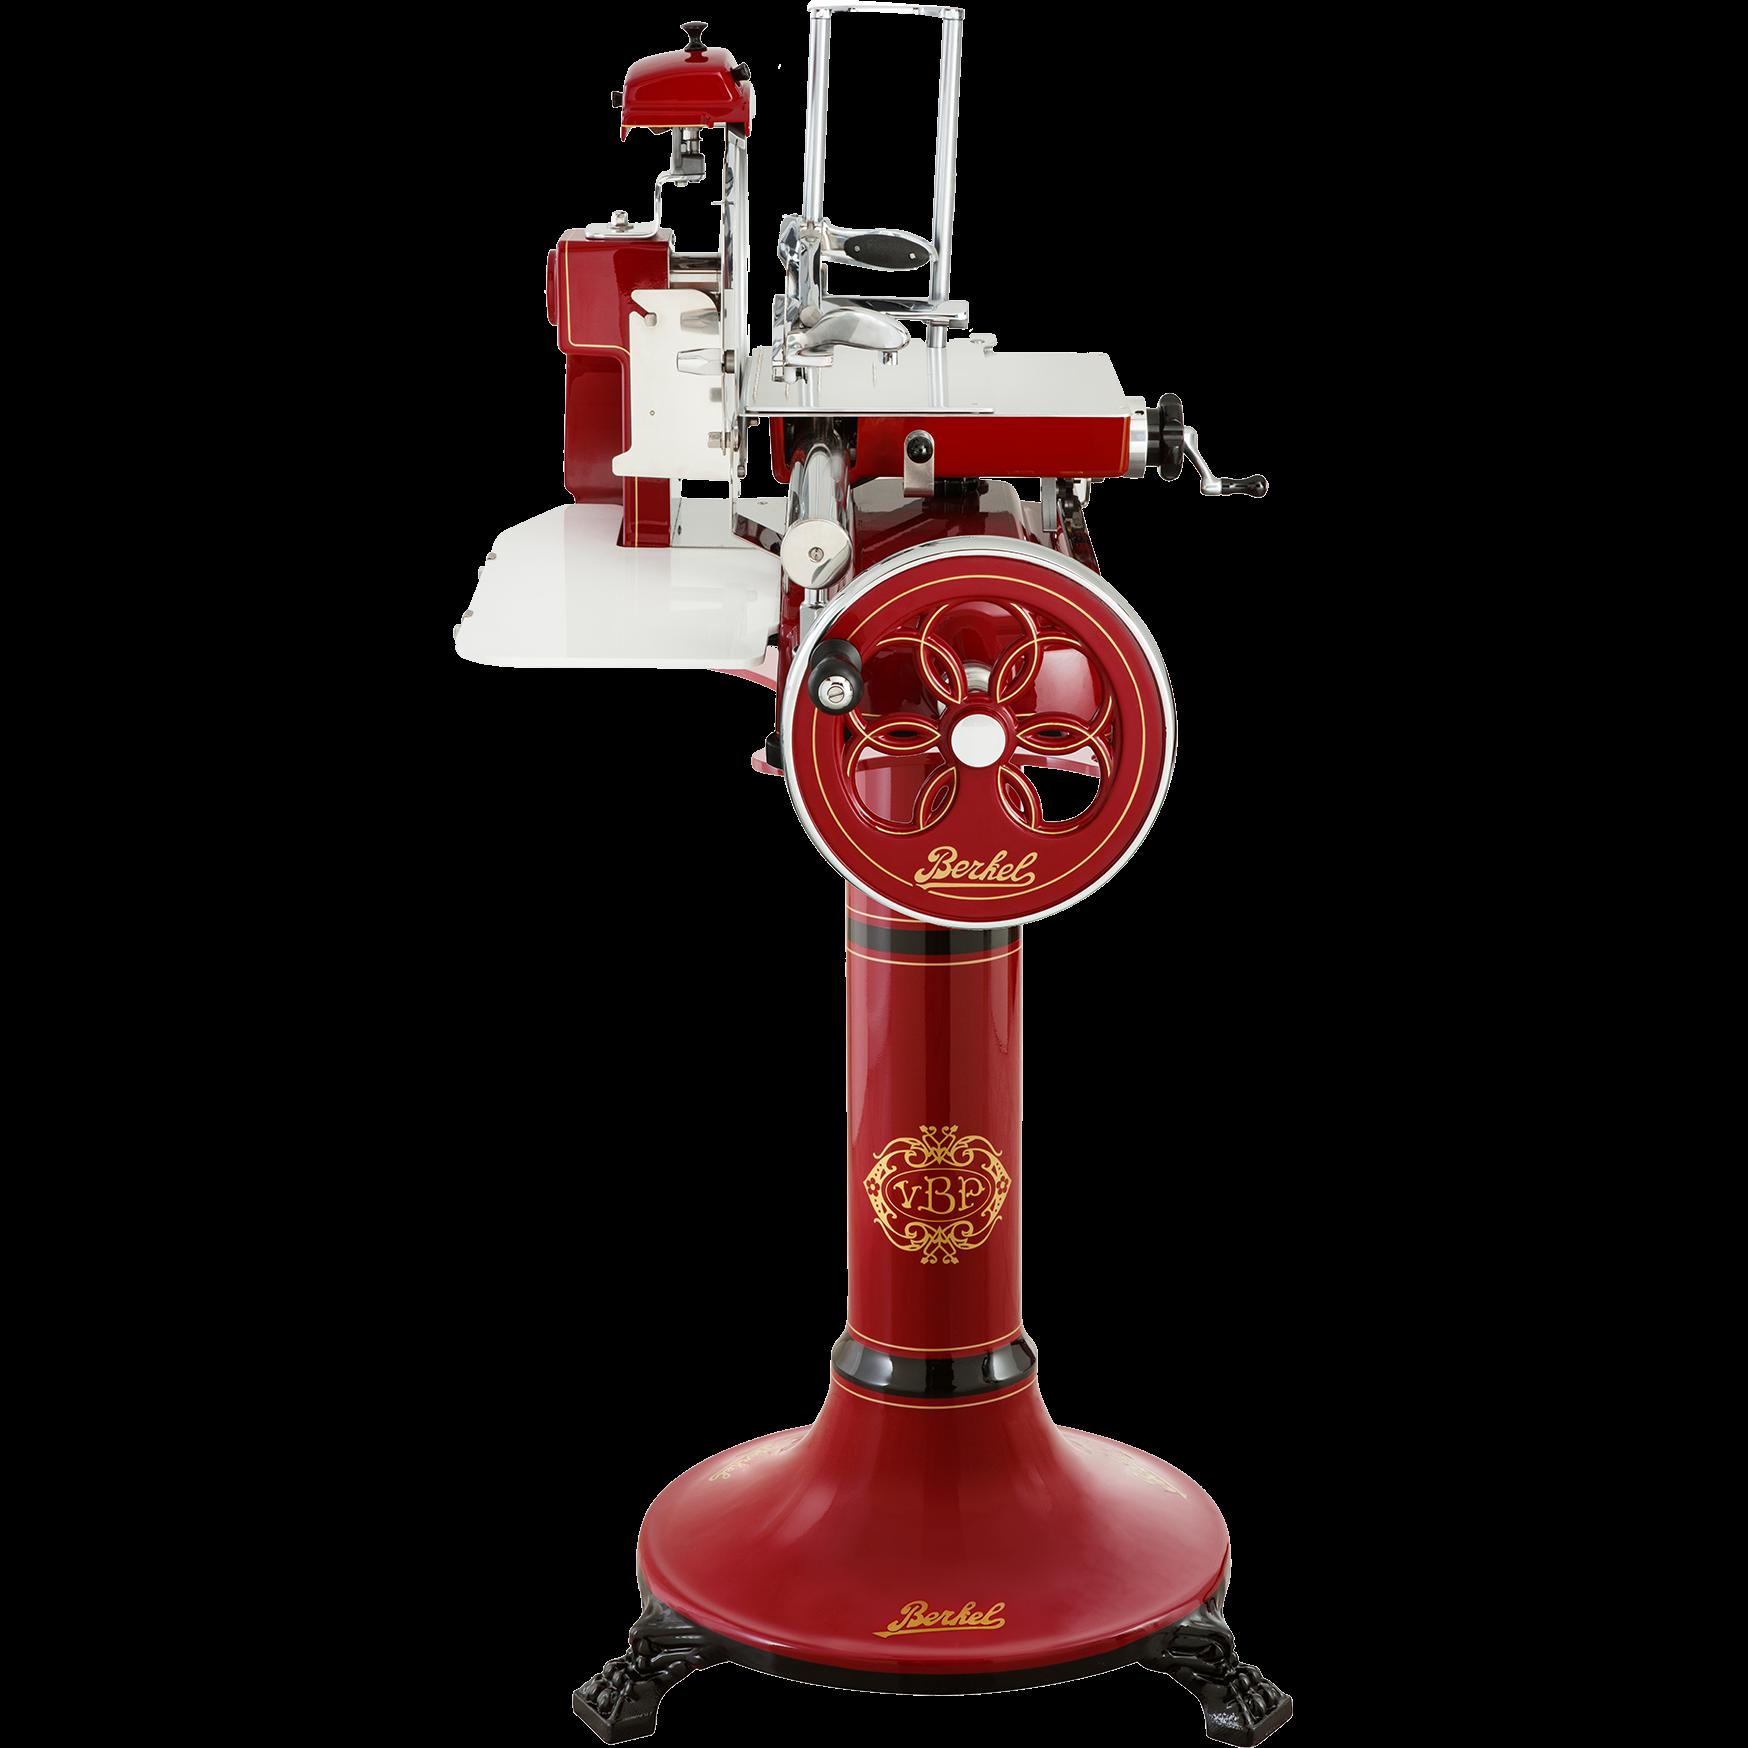 berkel-flywheel-slicer-vlb3-red-front-stand_web_1